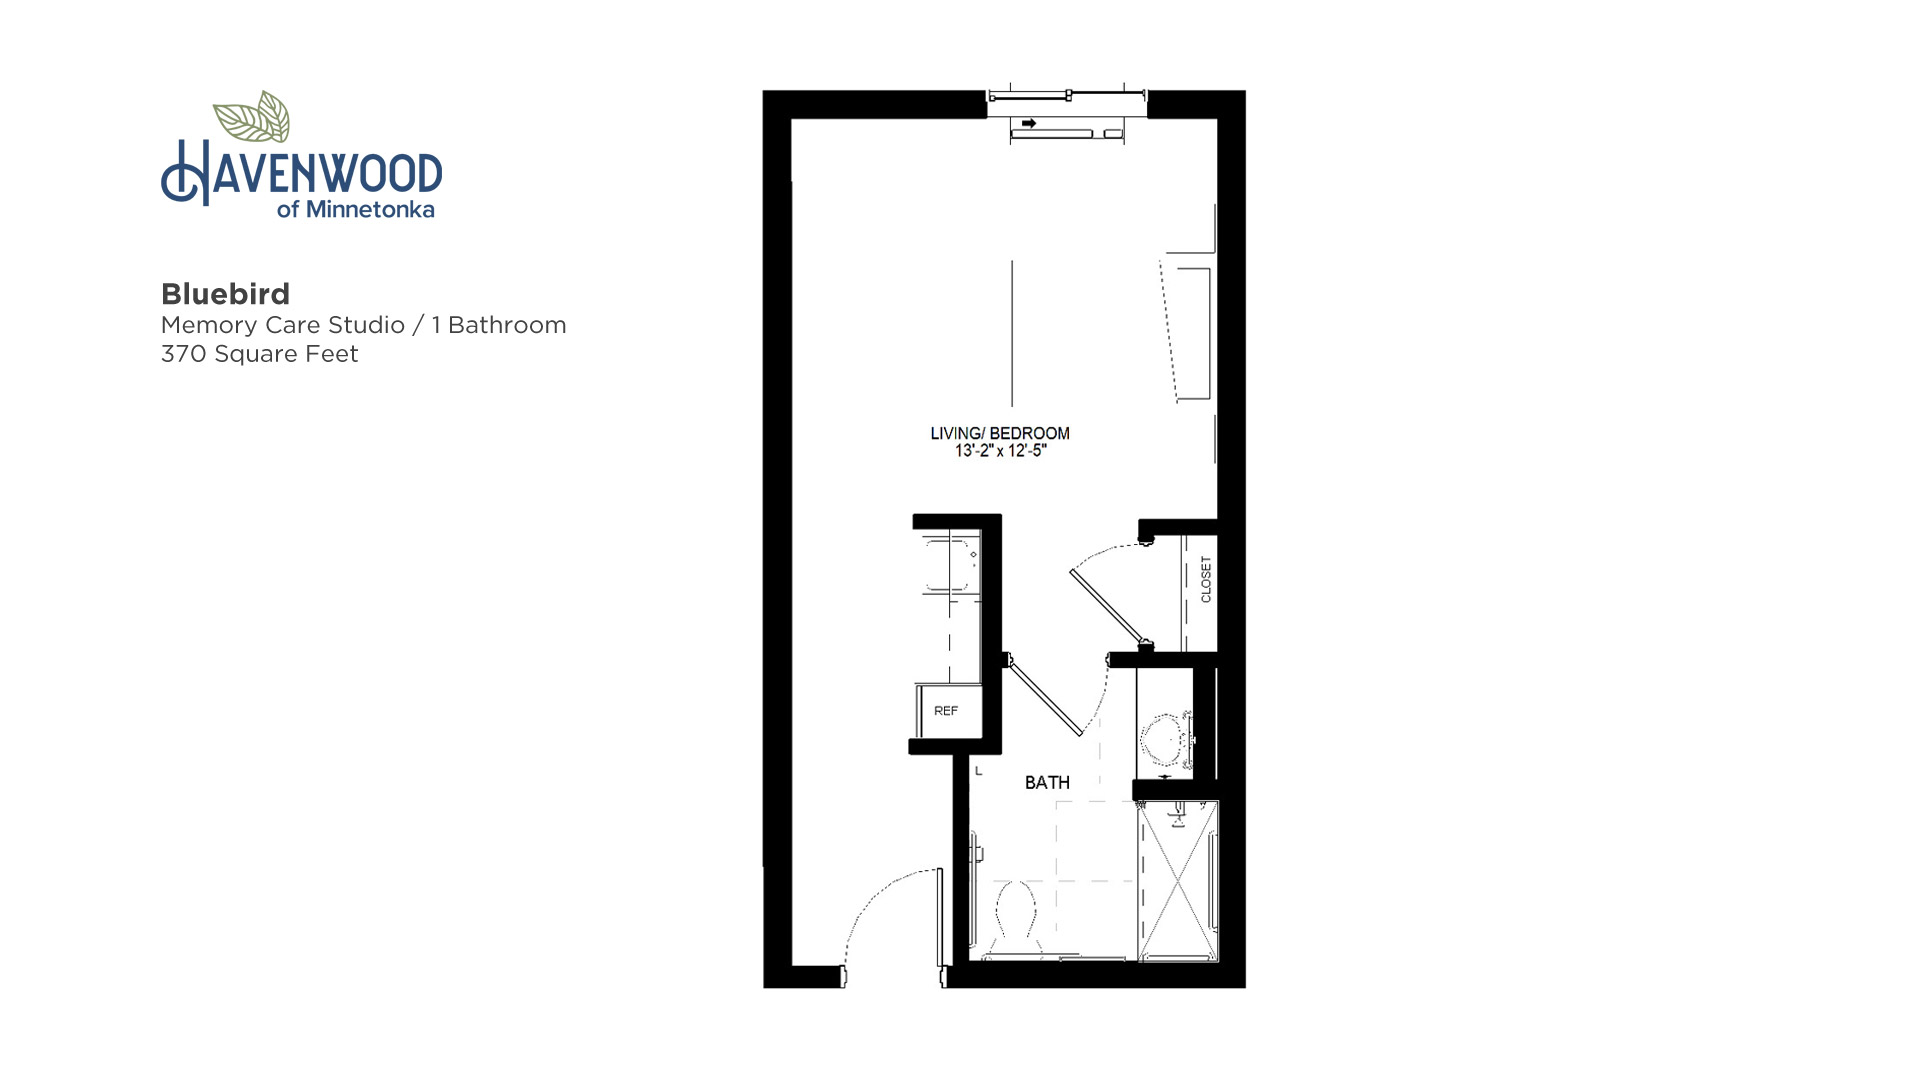 Havenwood of Minnetonka Bluebird Floor Plan